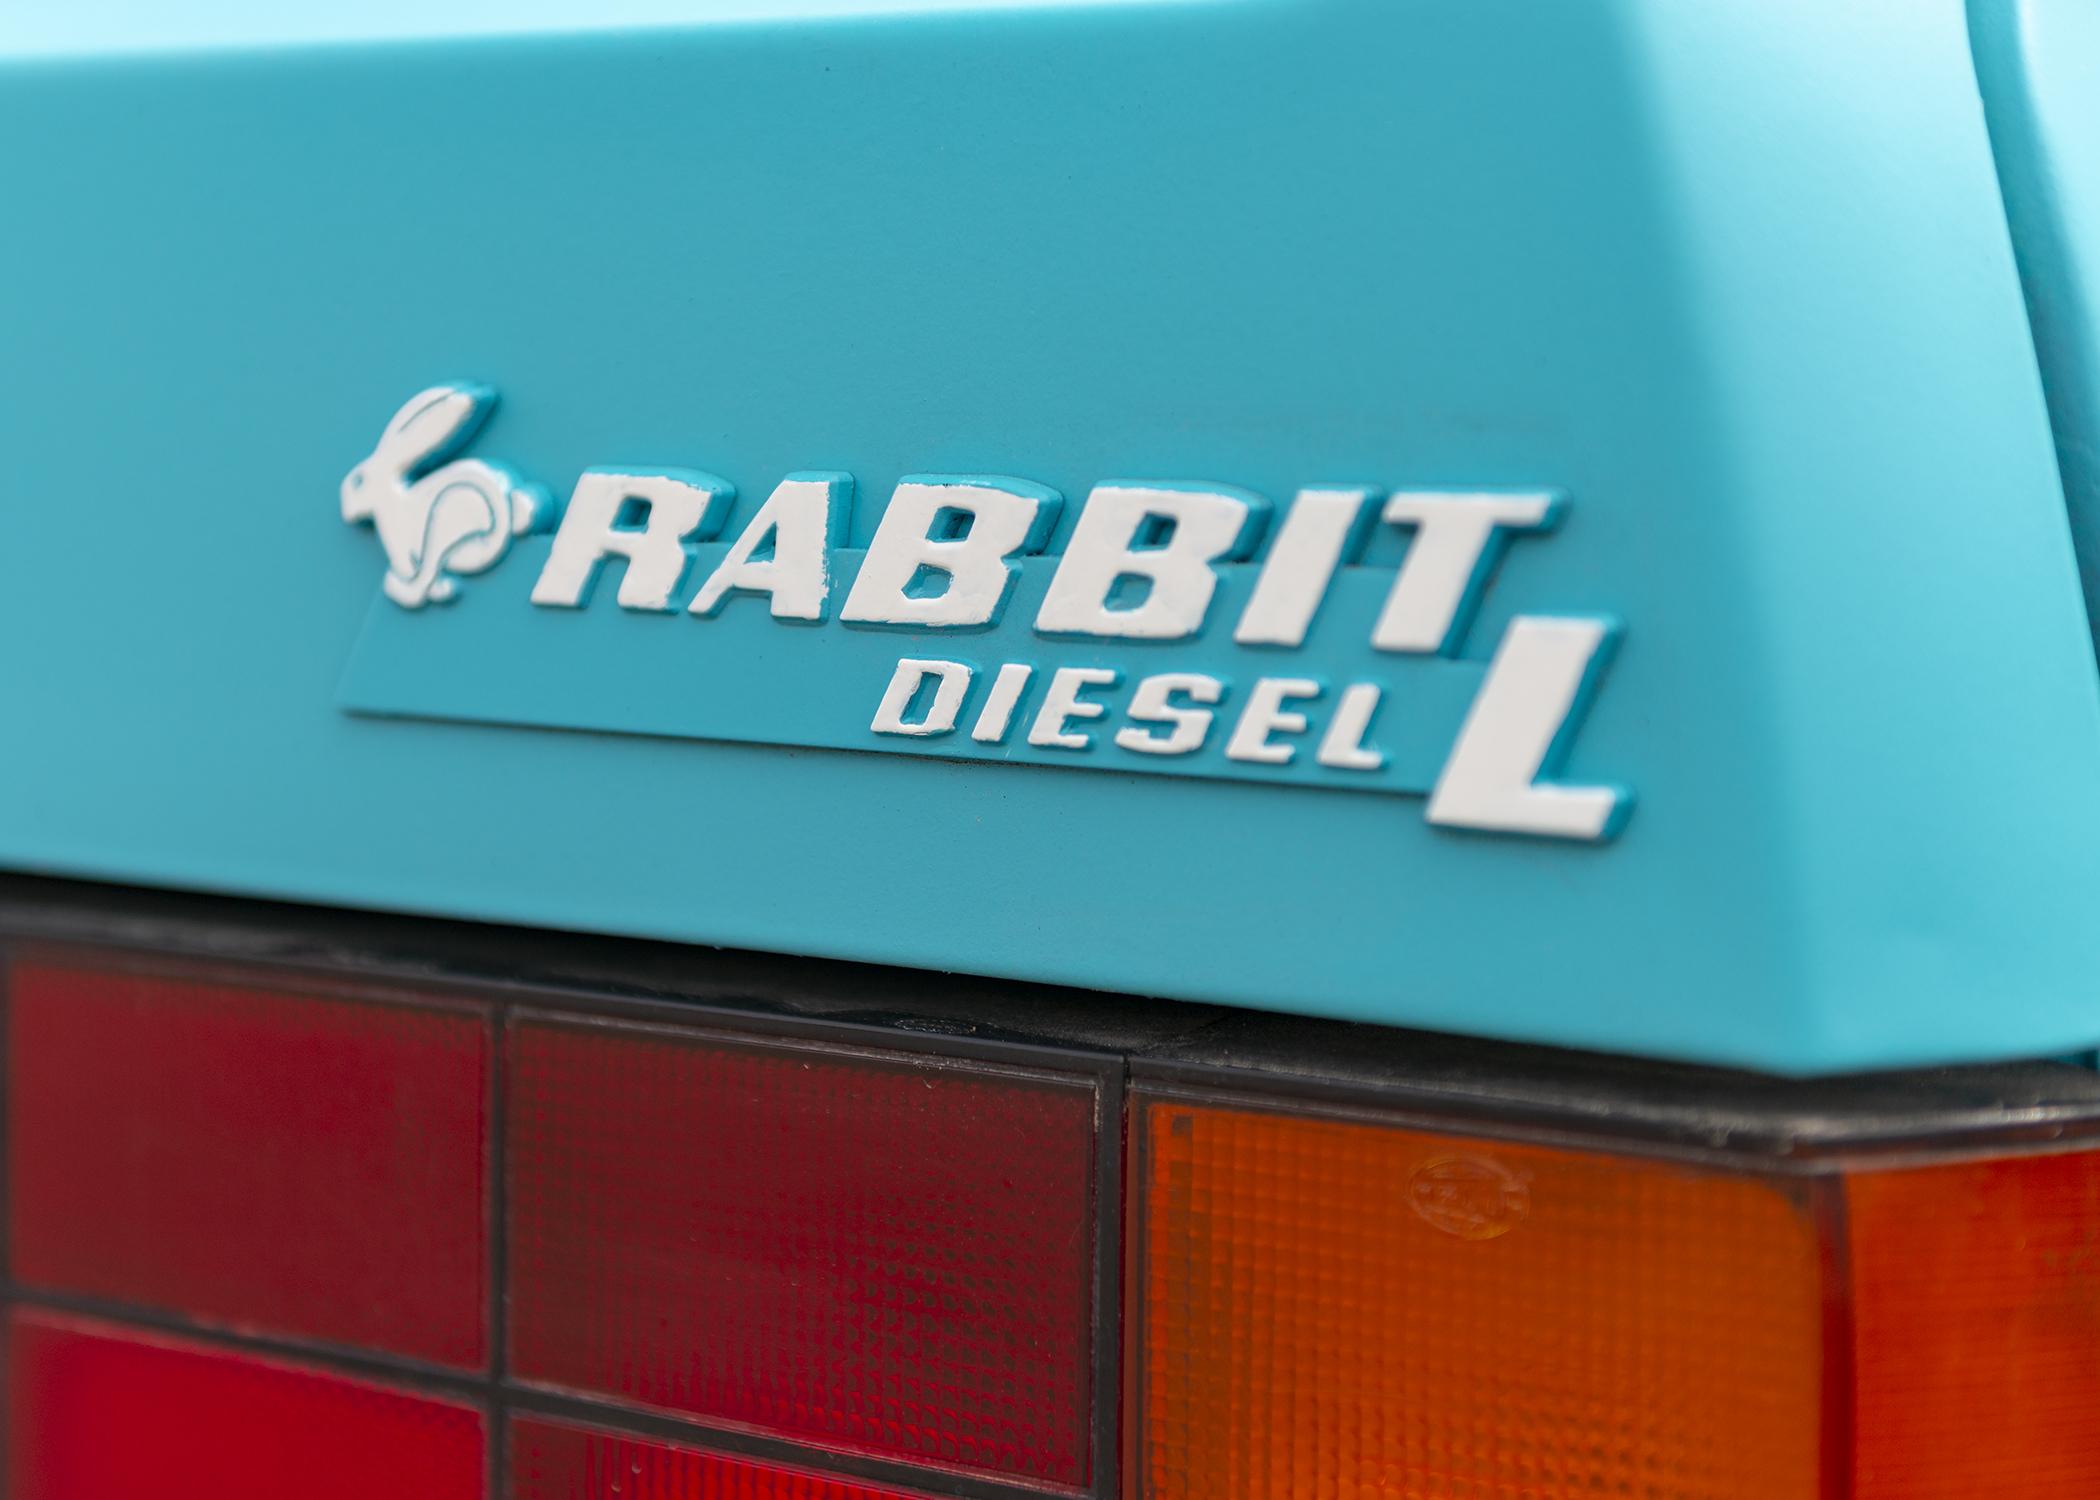 Volkswagen Rabbit Diesel L. Timeless styling by Giorgetto Giugiaro's ItalDesign.